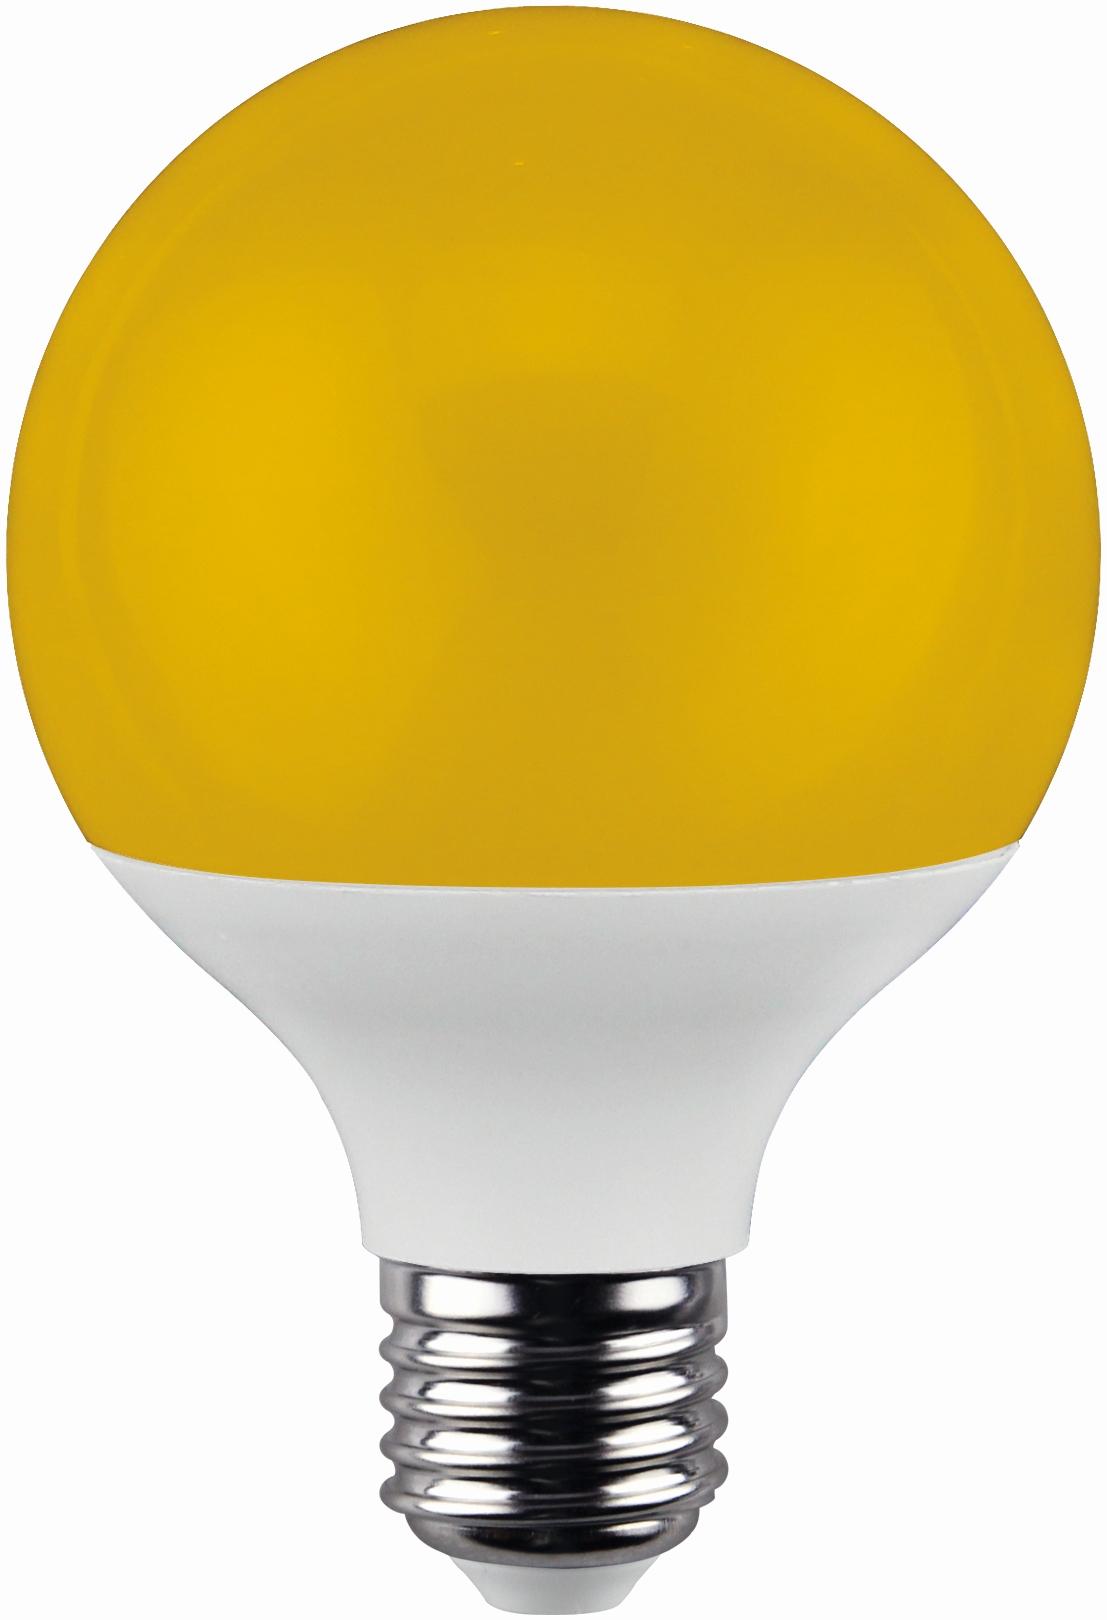 Farluma LED Kugel klein Blaulicht-Filter 10W E27